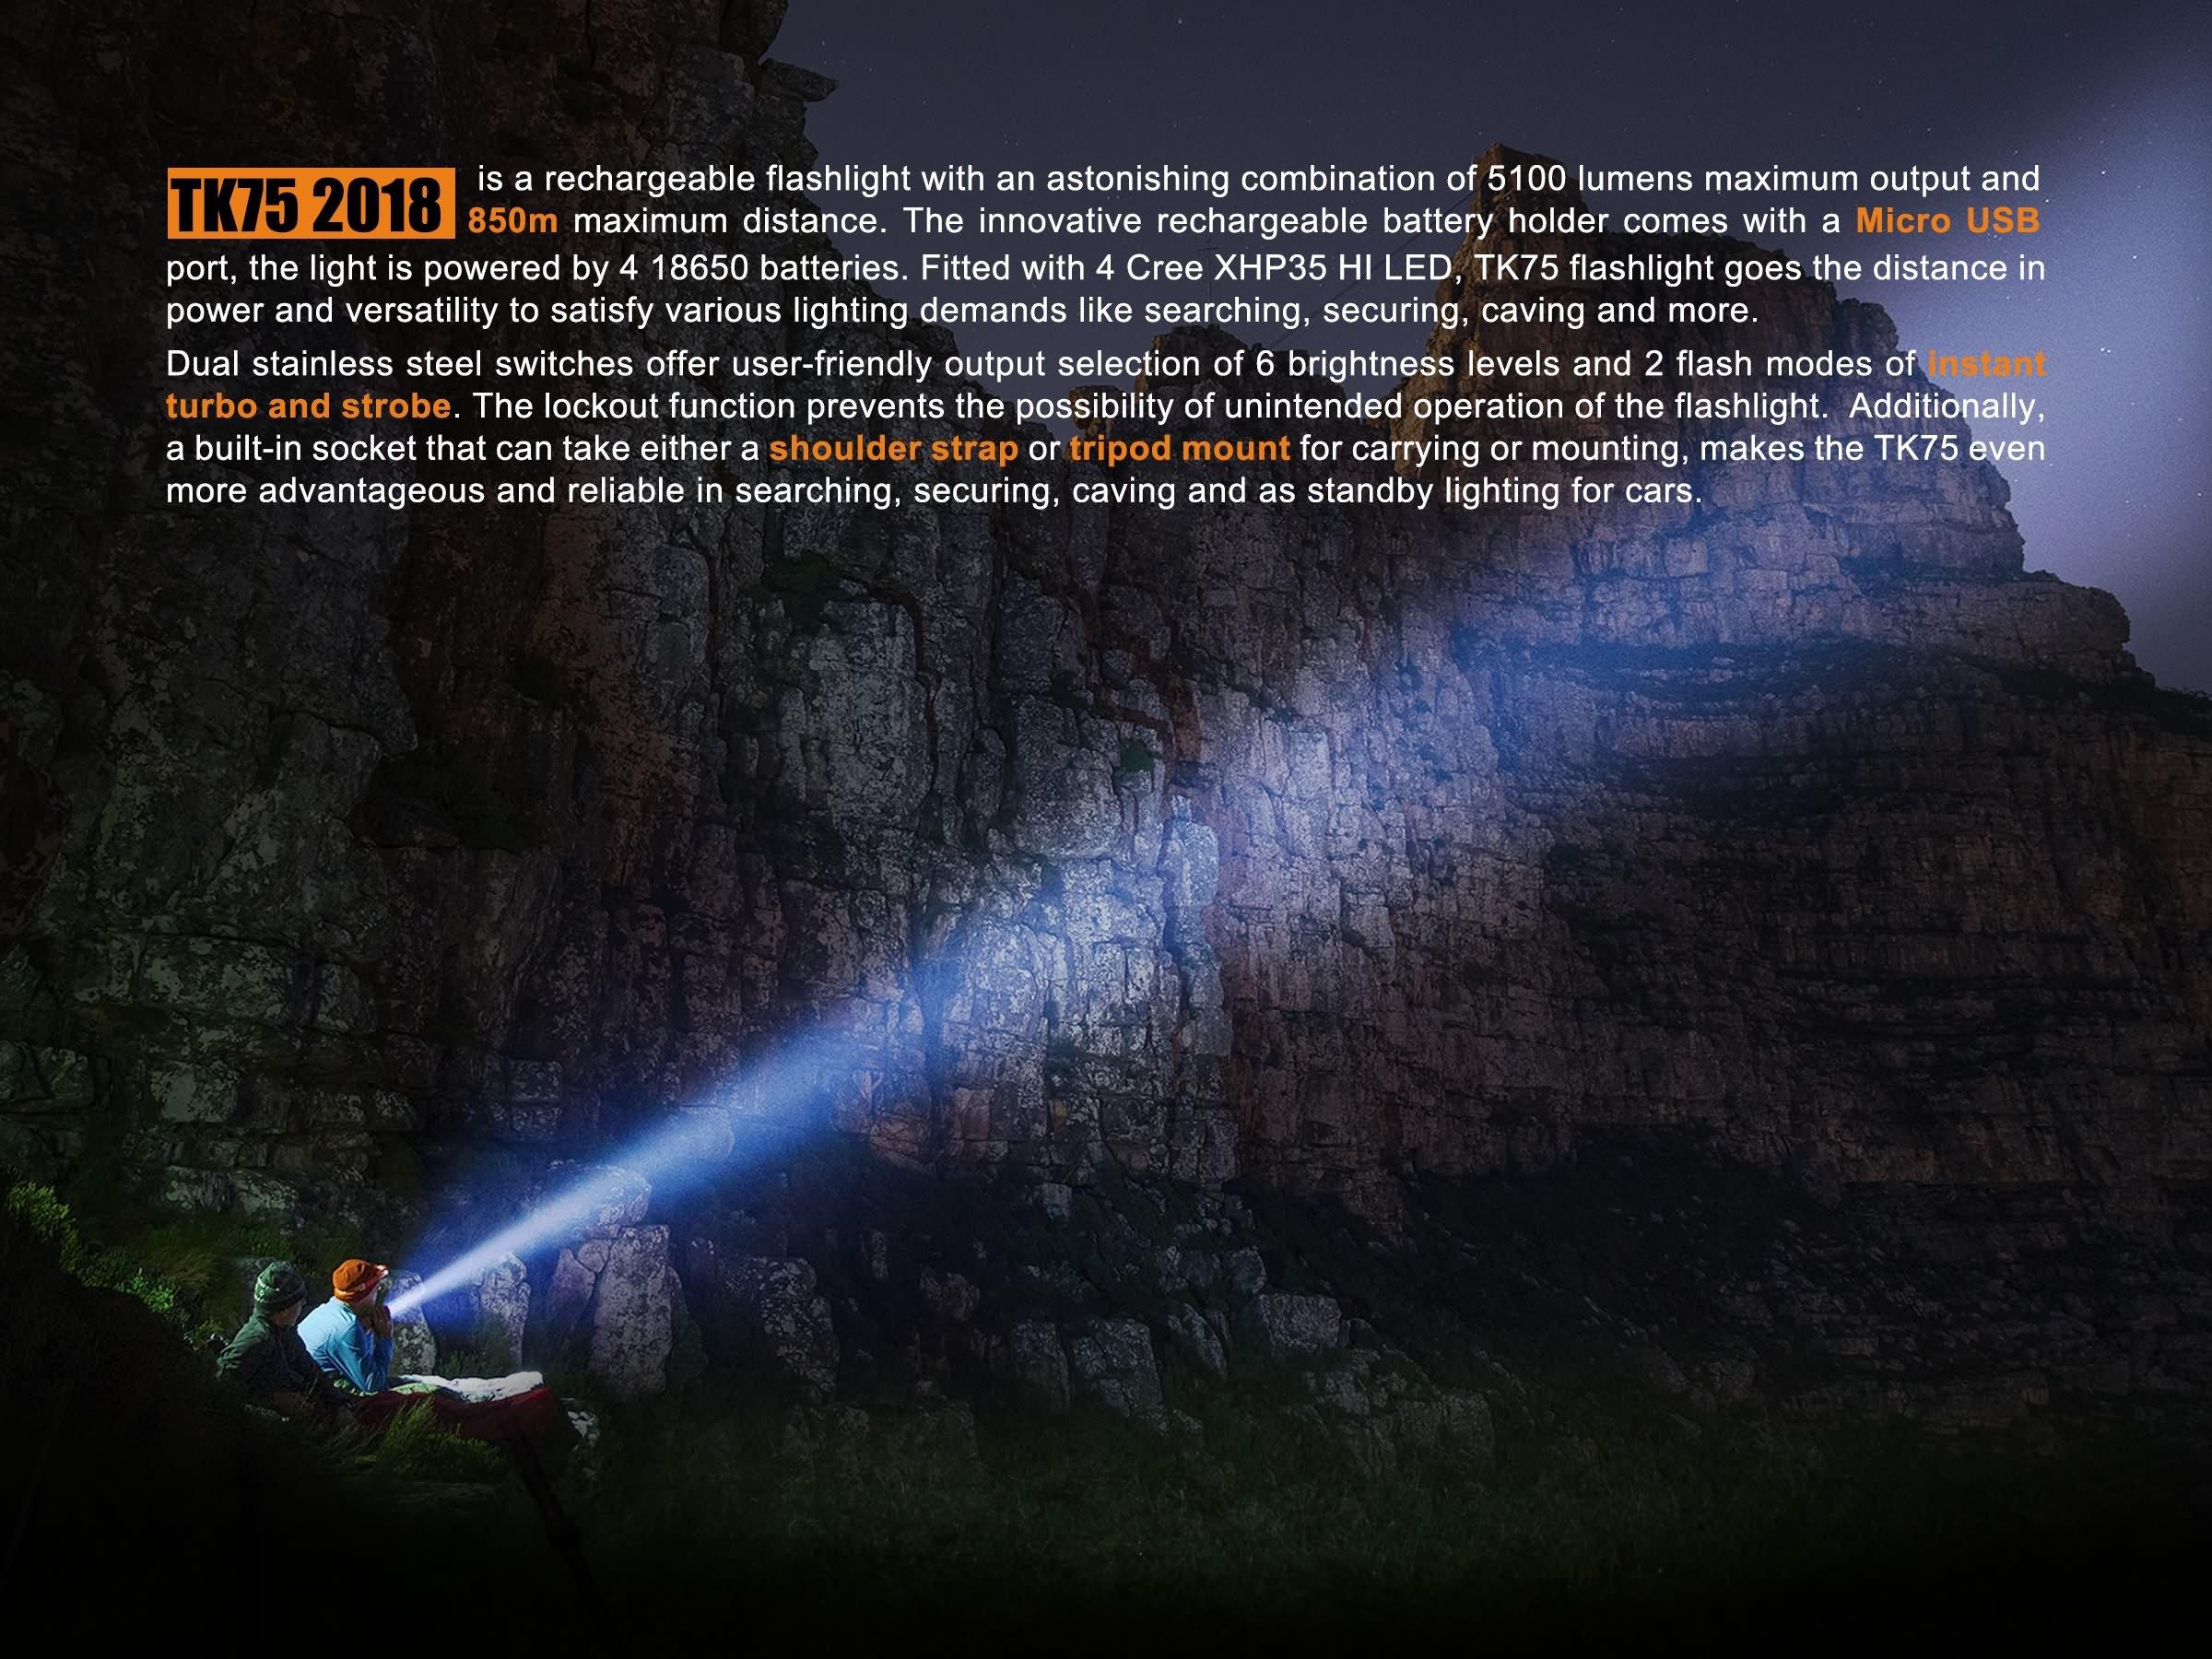 Fenix TK75 2018 5100 Lumens High-Performance Long-Throw Micro-USB Rechargeable Flashlight, 4x 3500mAh 18650 Rechargeable Batteries, 2x Lumen Tactical Battery Organizers by Fenix (Image #4)